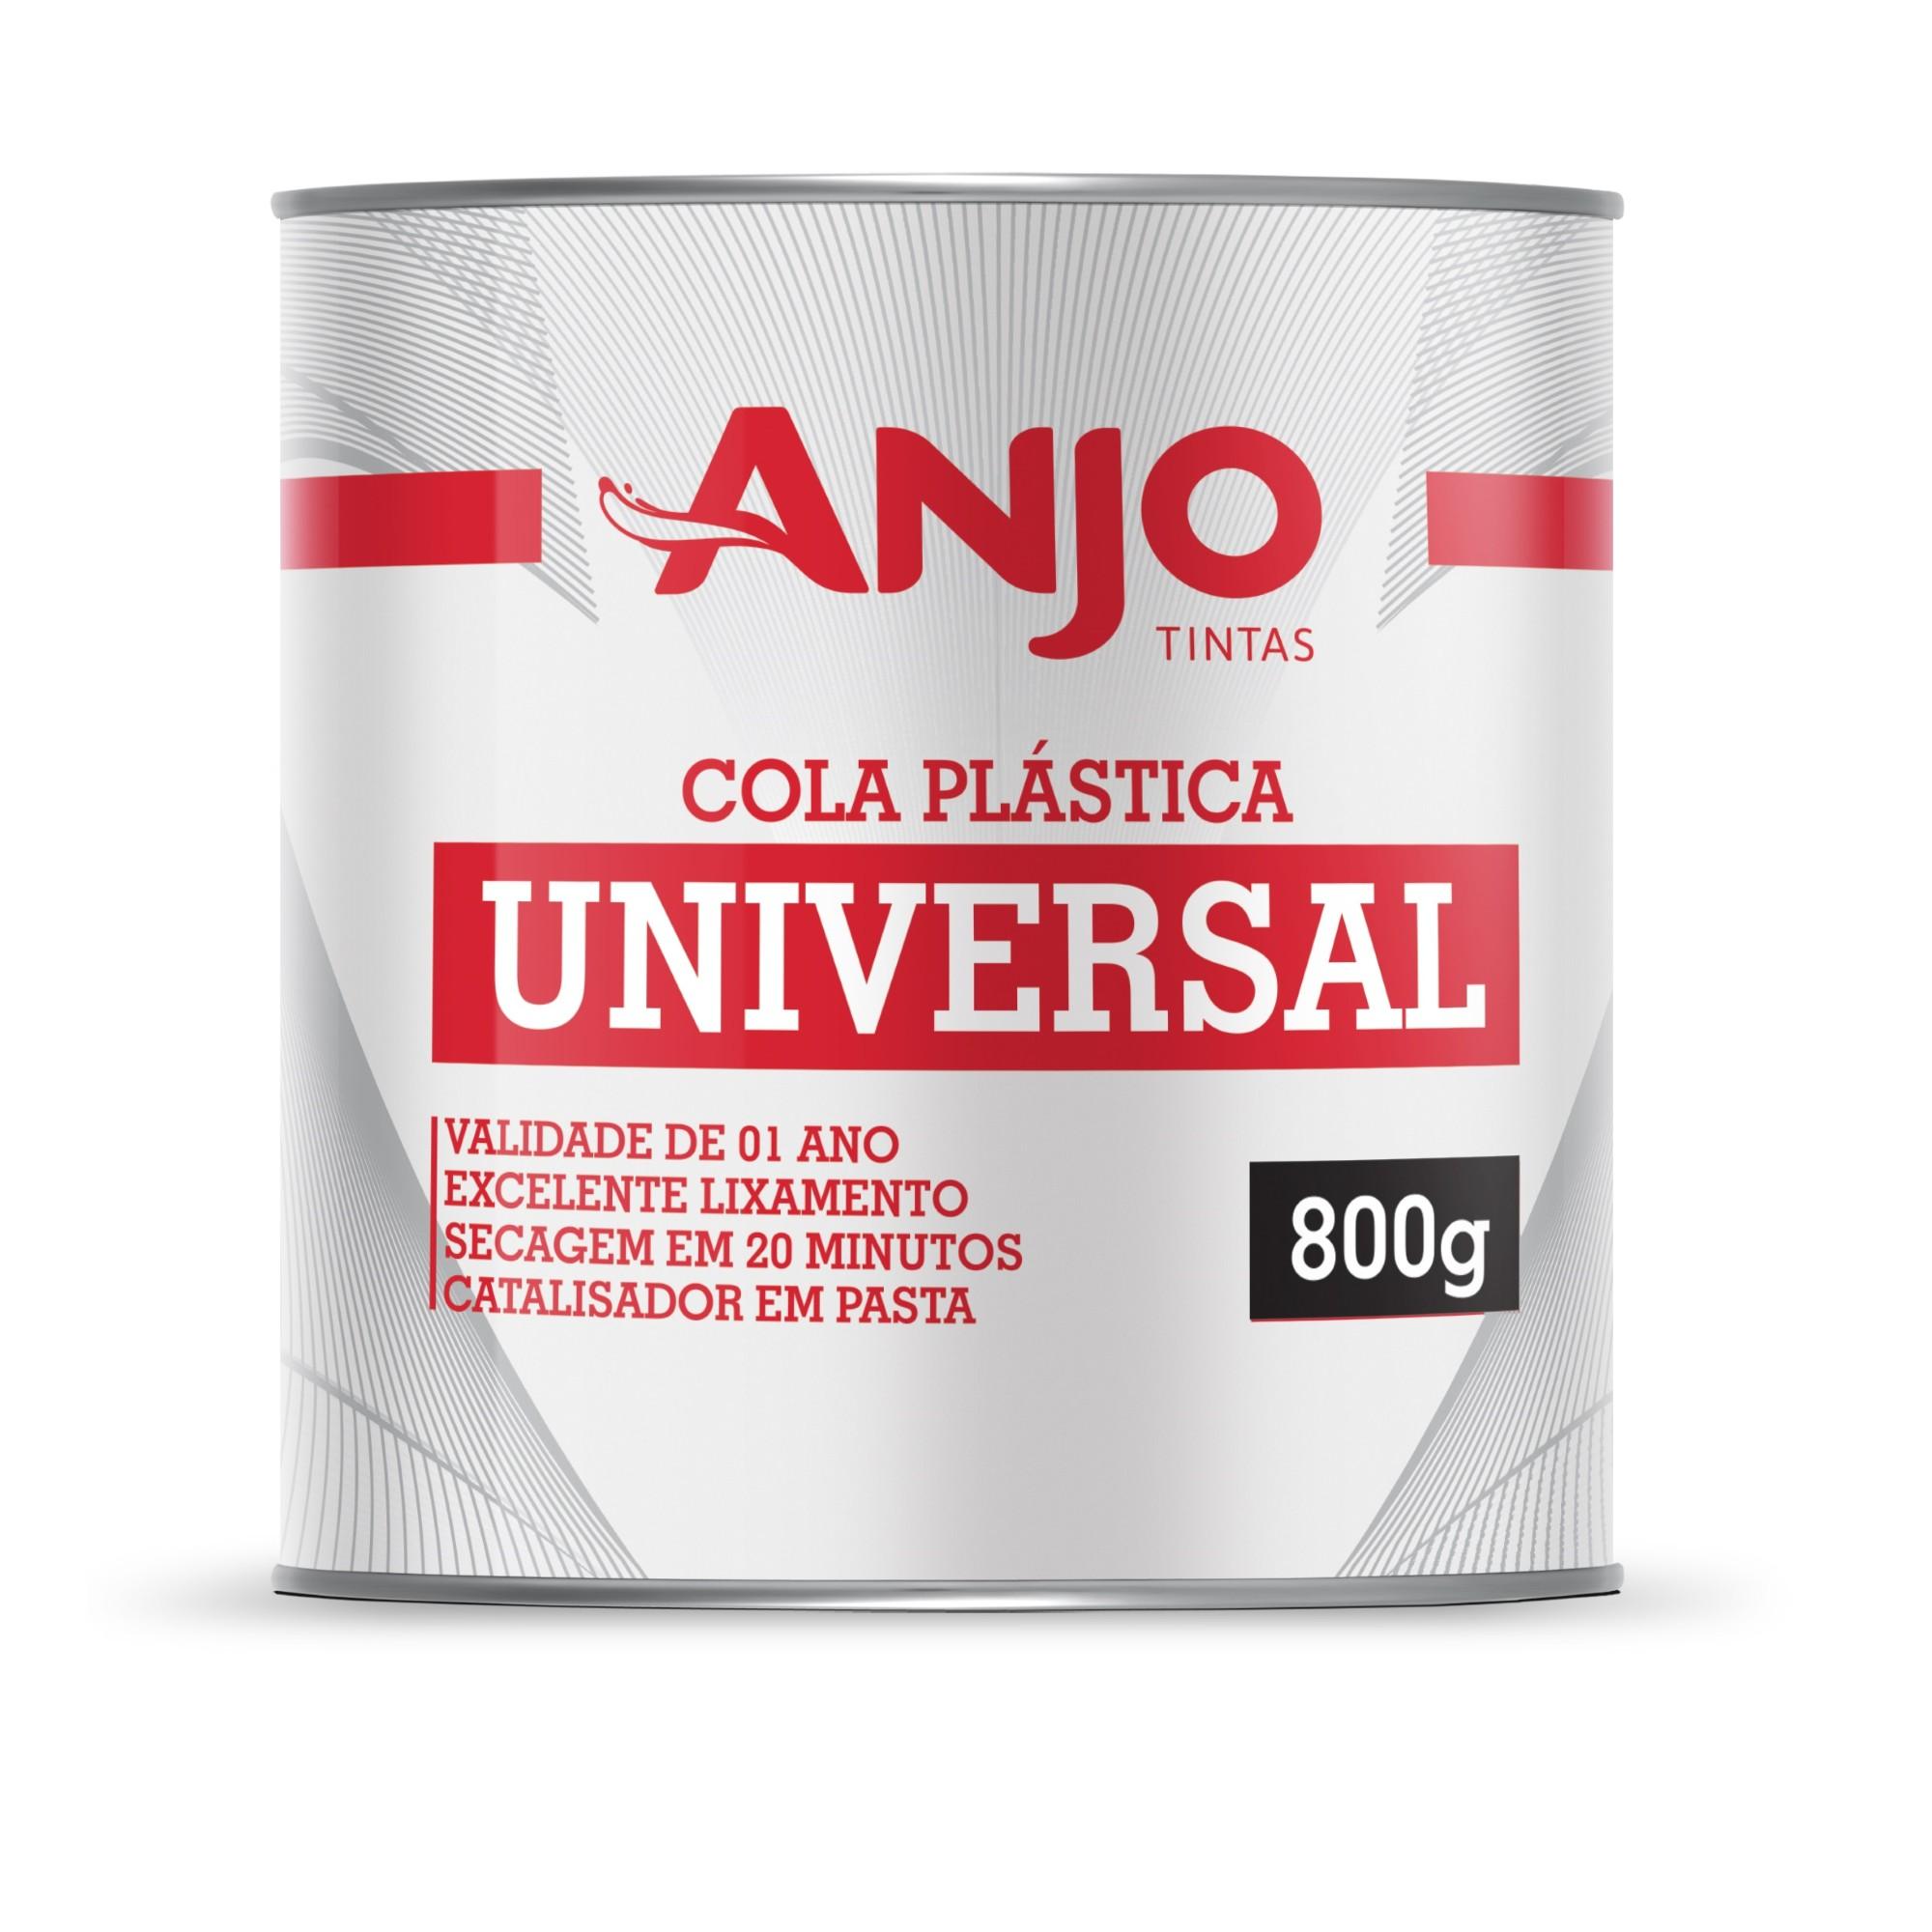 Cola Plastica Universal 800g - Anjo